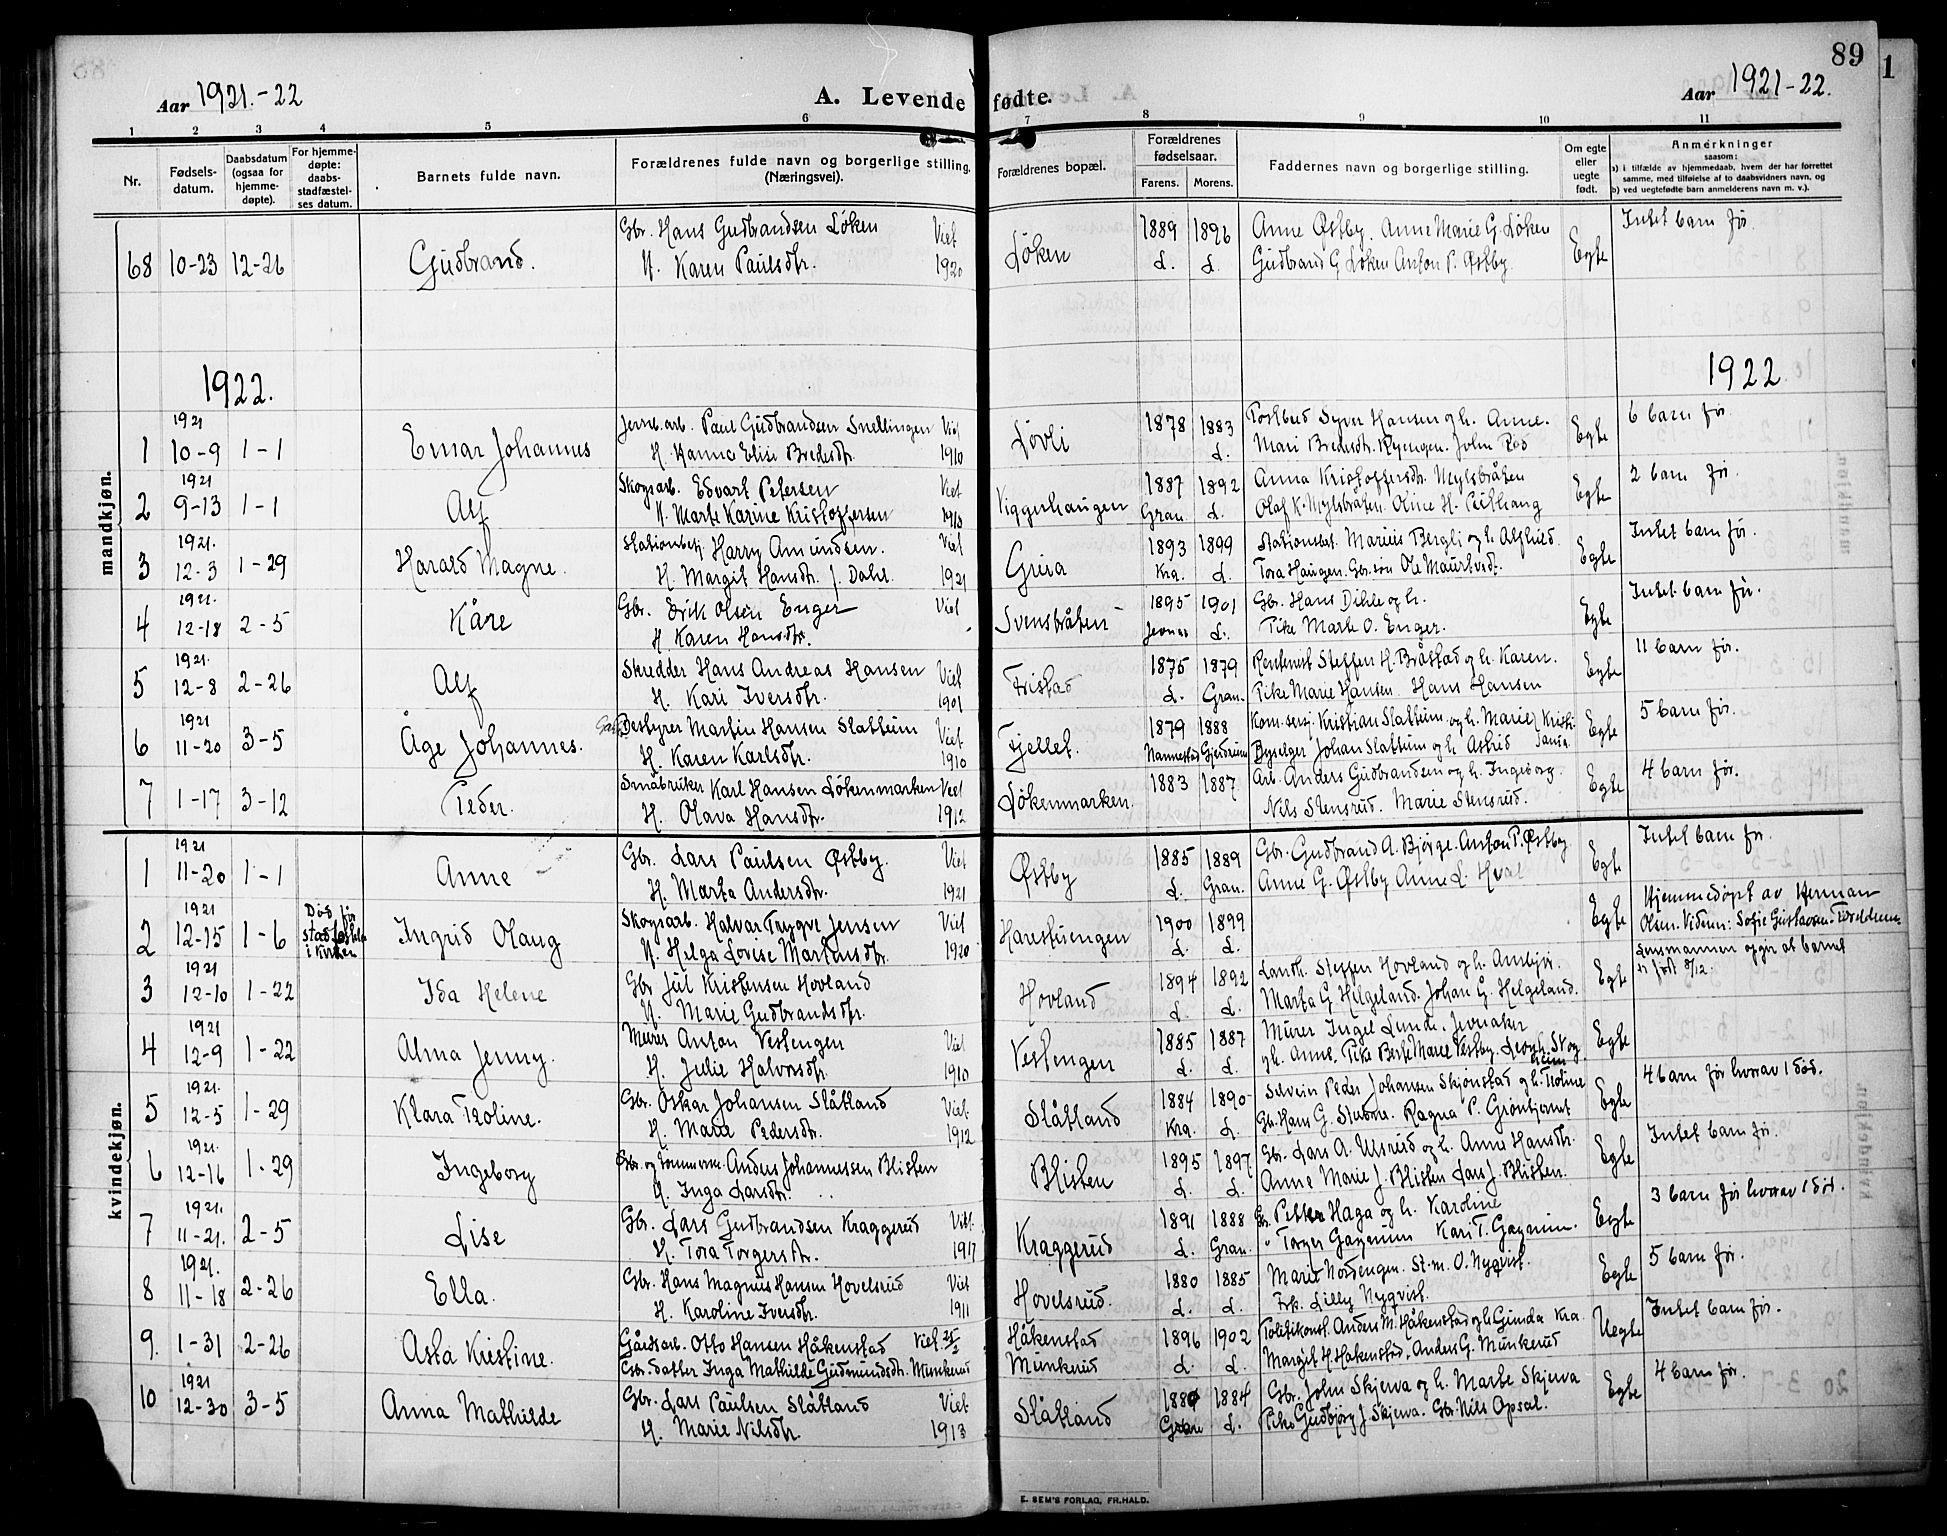 SAH, Lunner prestekontor, H/Ha/Hab/L0001: Klokkerbok nr. 1, 1909-1922, s. 89